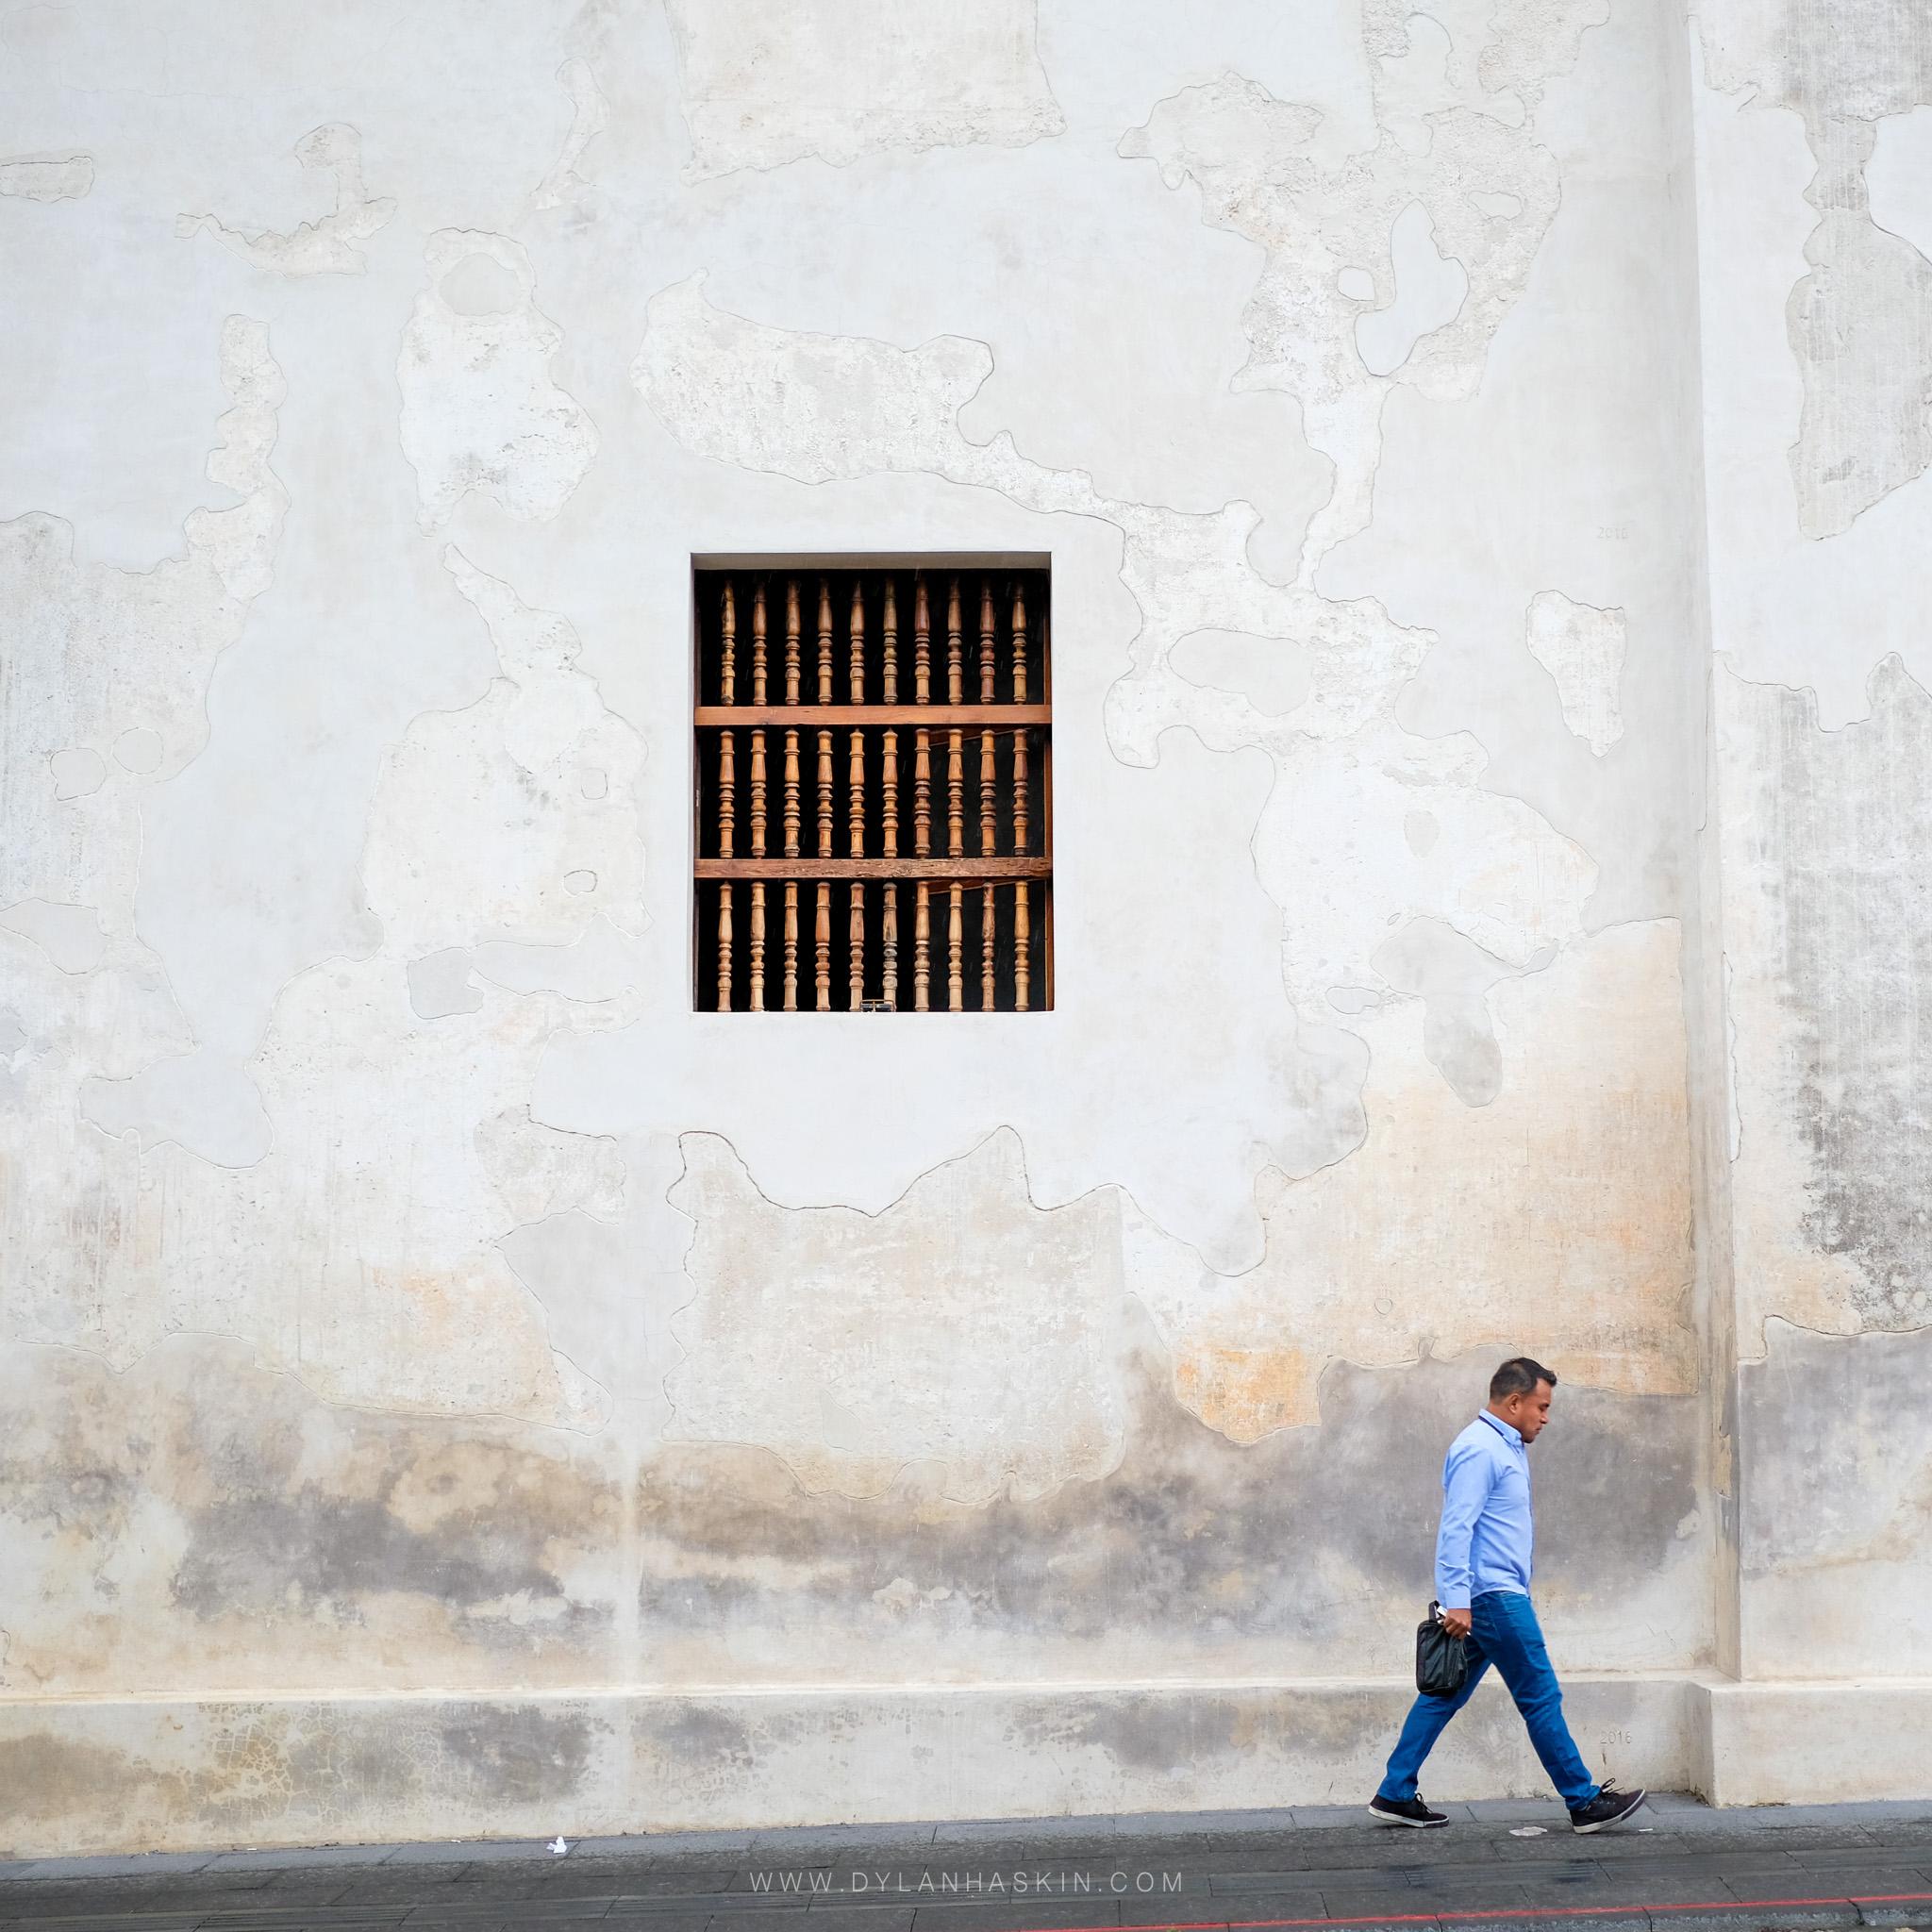 Guatemala Doors and Windows